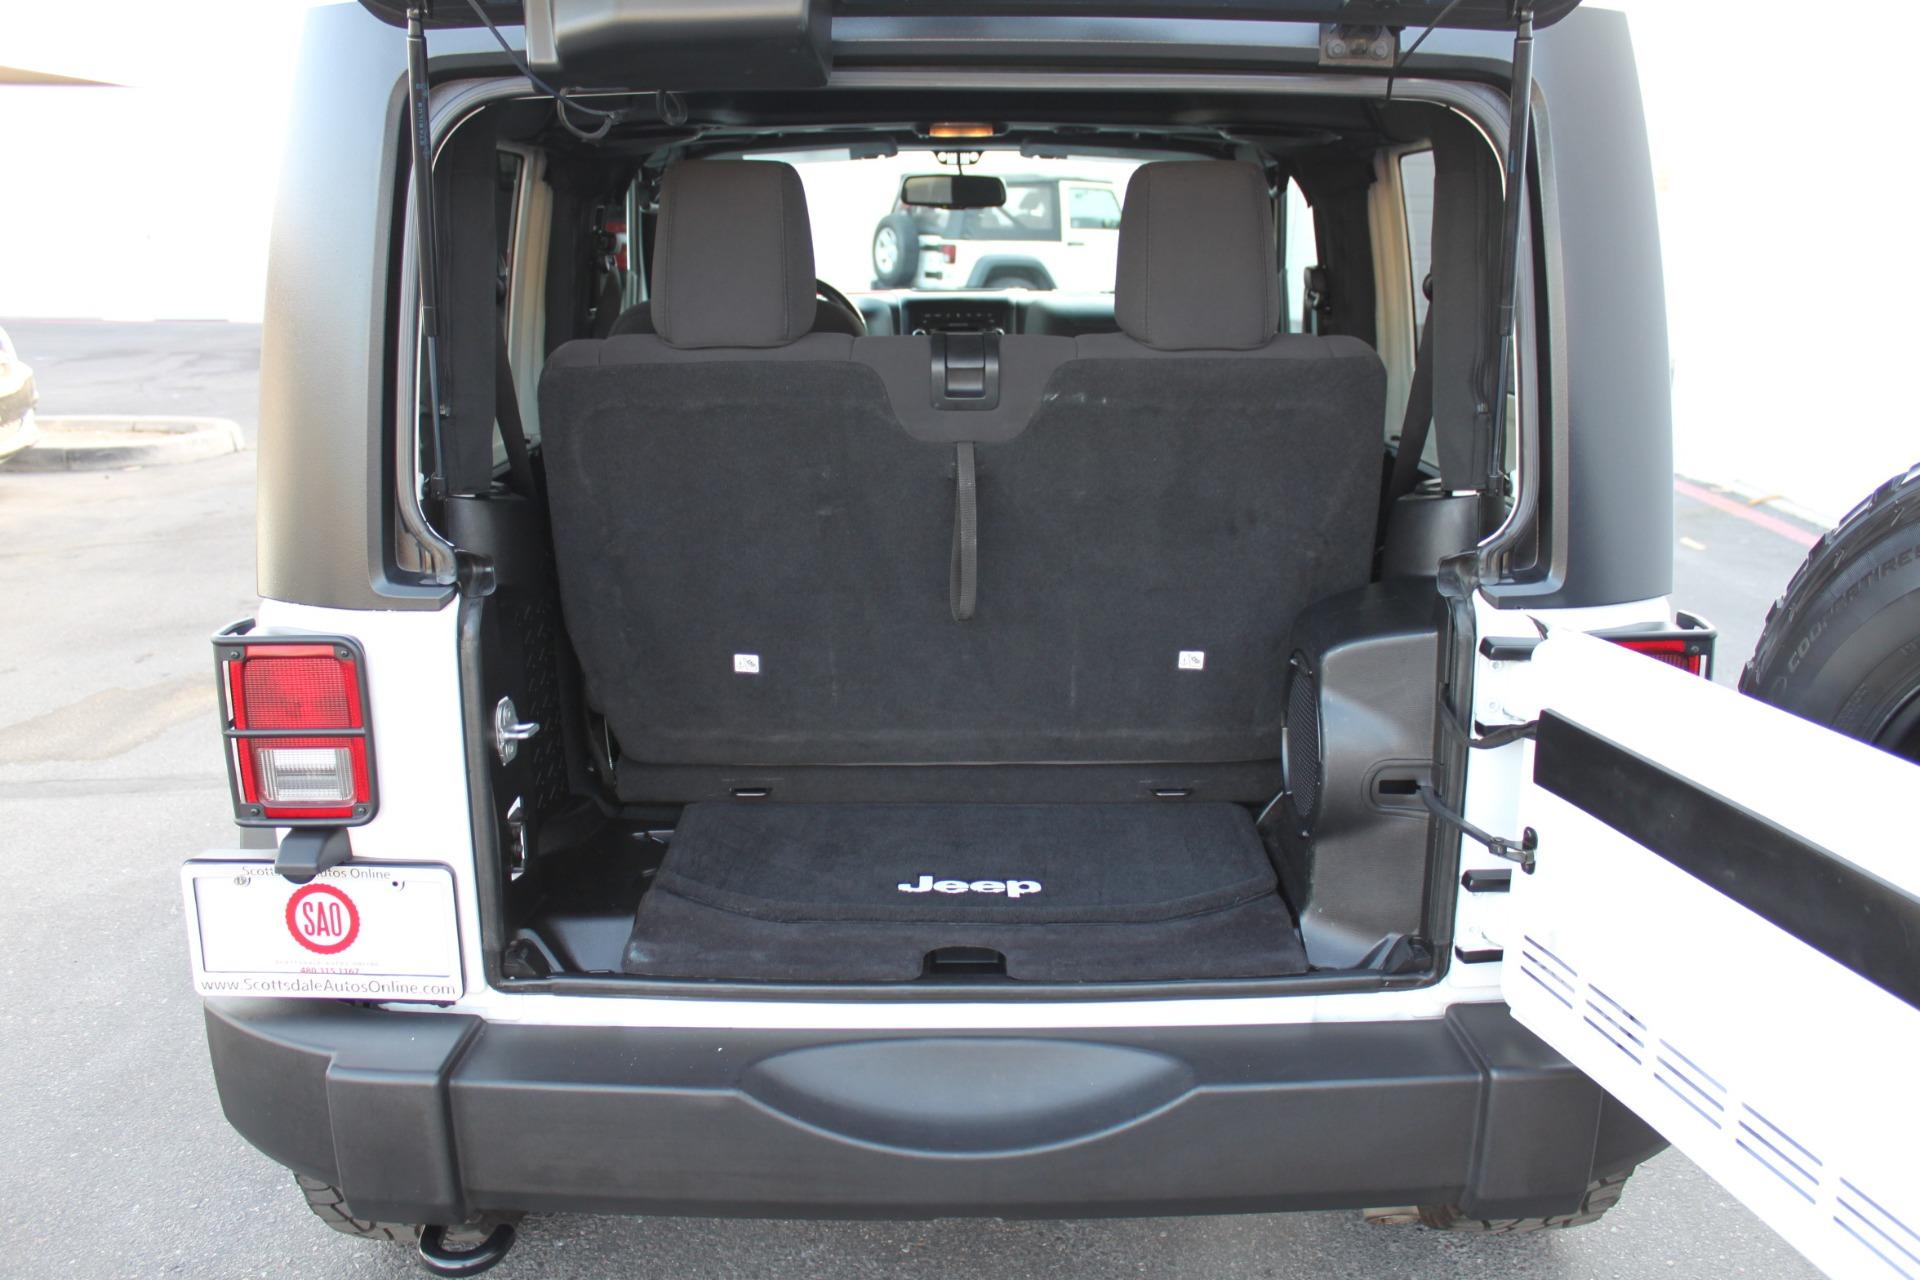 Used-2013-Jeep-Wrangler-Sport-S-4X4-Mercedes-Benz